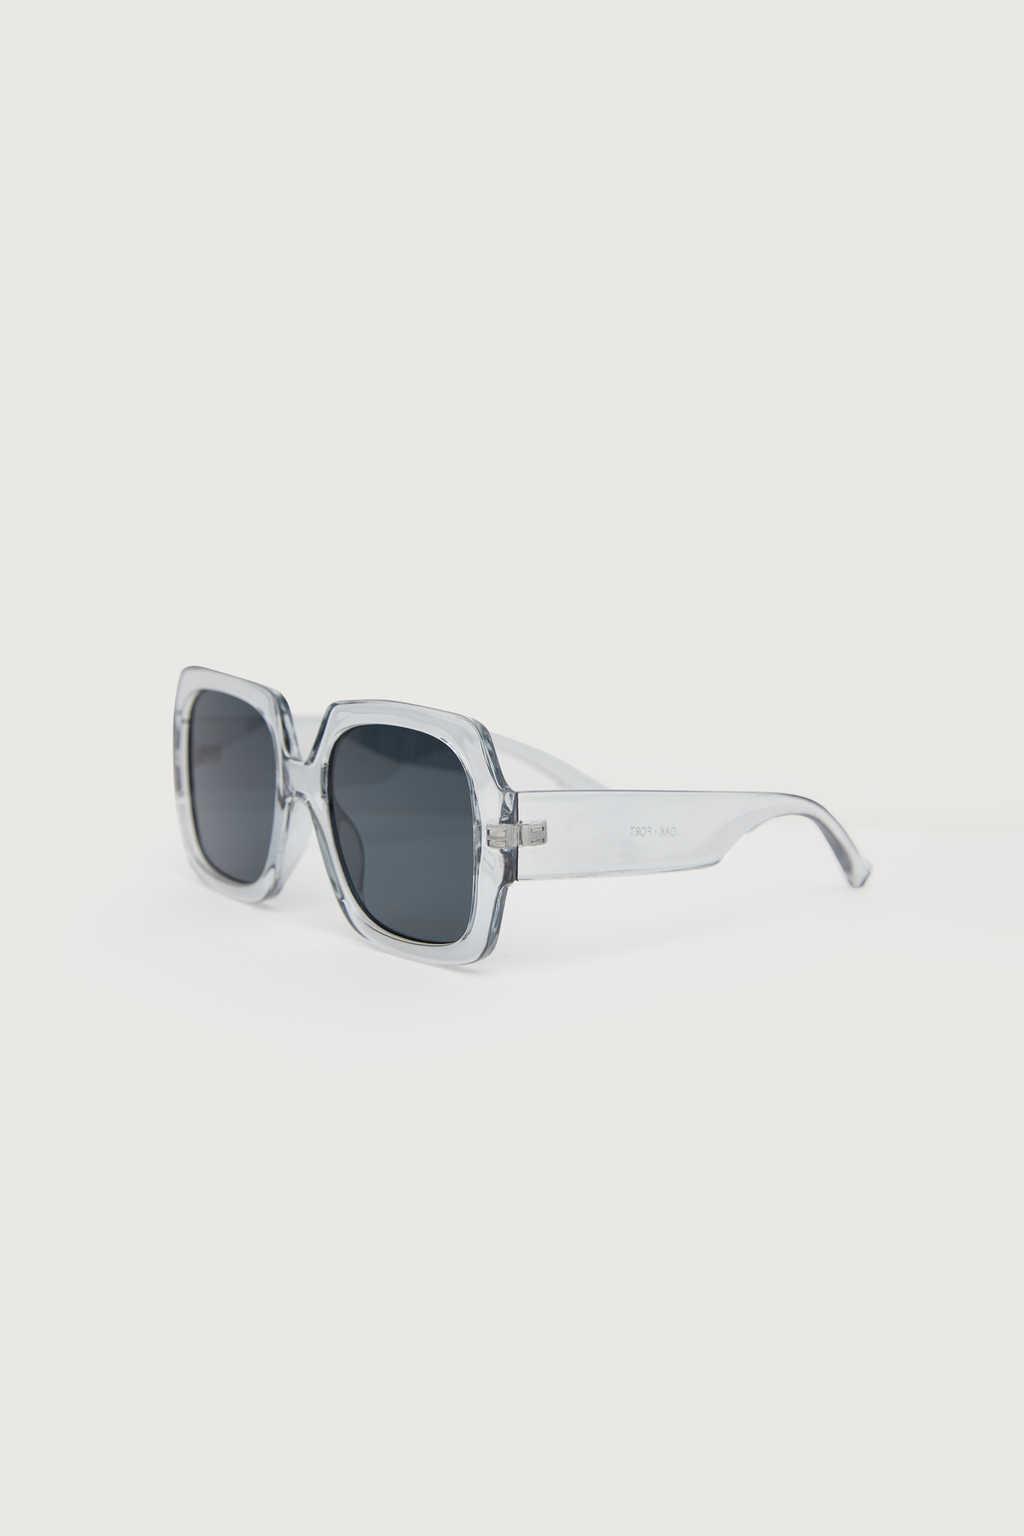 Sunglass 3368 Gray 5